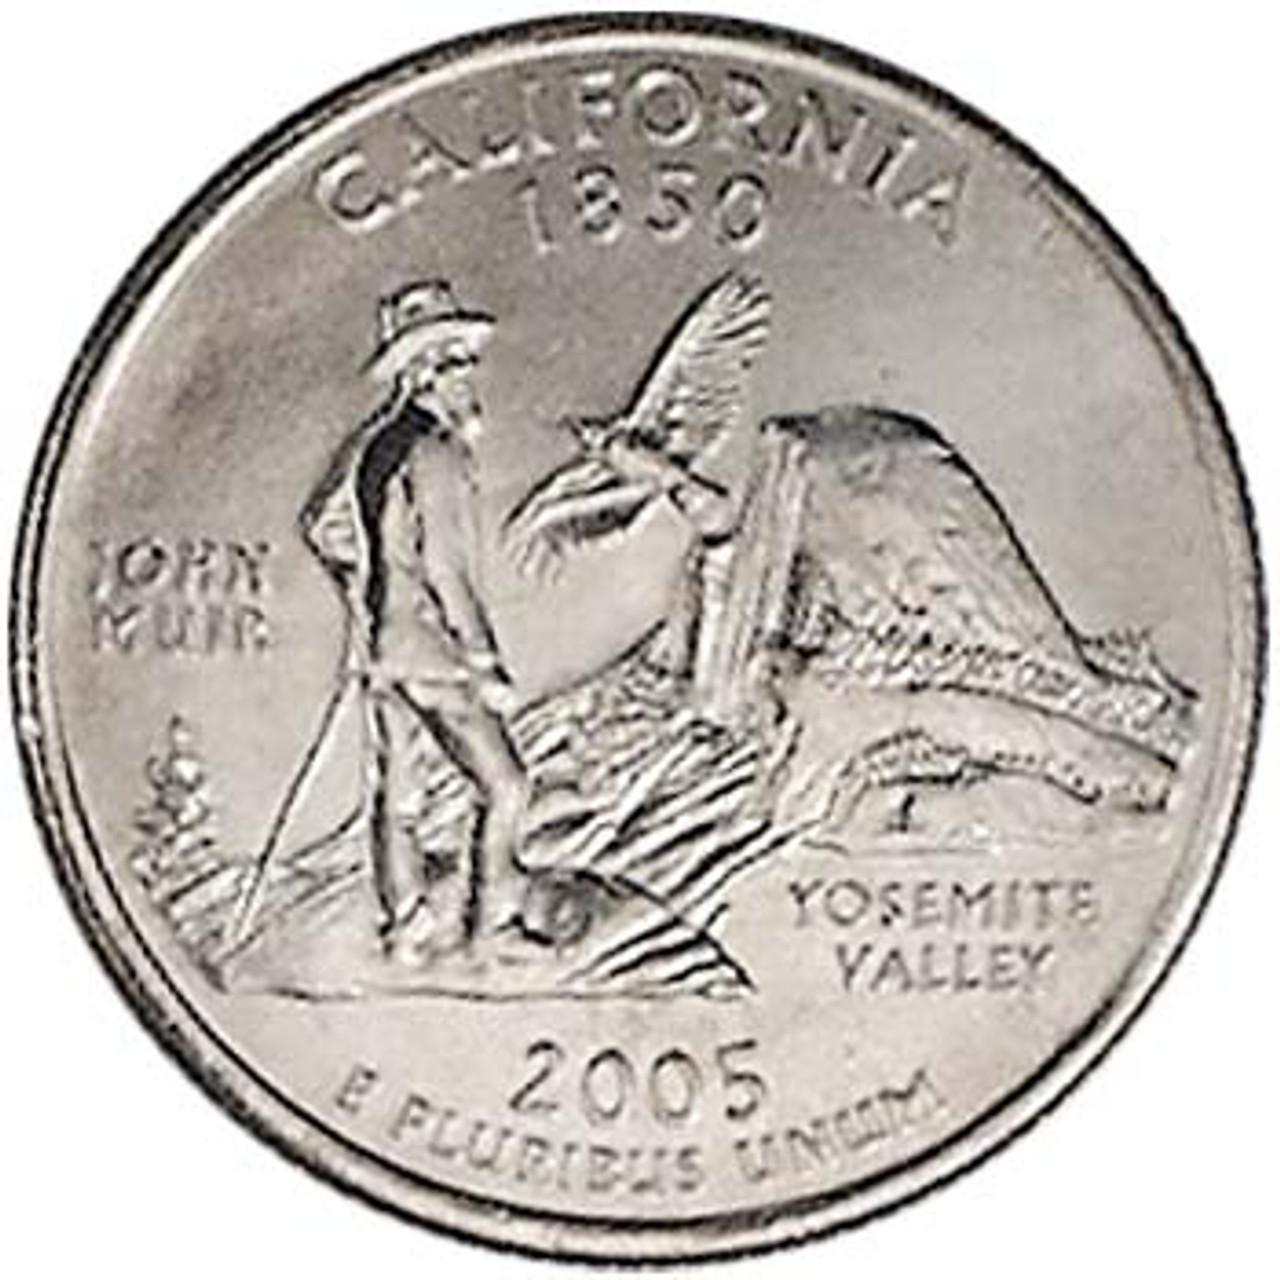 2005-D California Quarter Brilliant Uncirculated Image 1